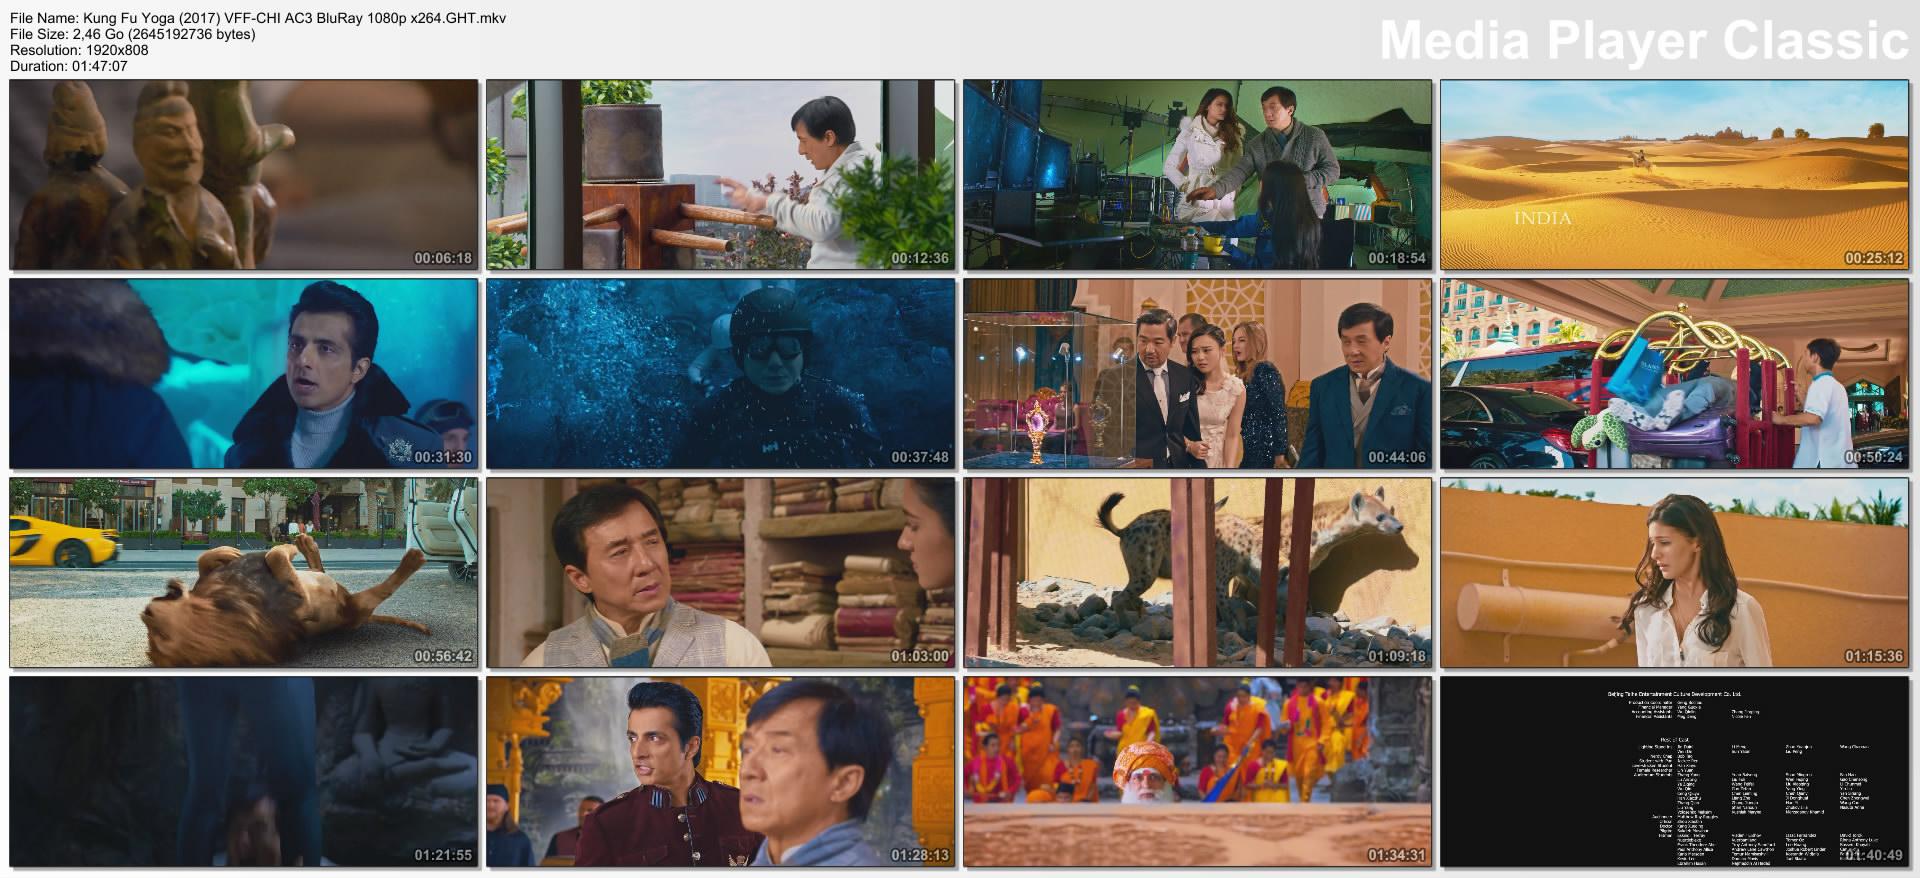 Kung Fu Yoga (2017) VFF-CHI AC3 BluRay 1080p x264.GHT